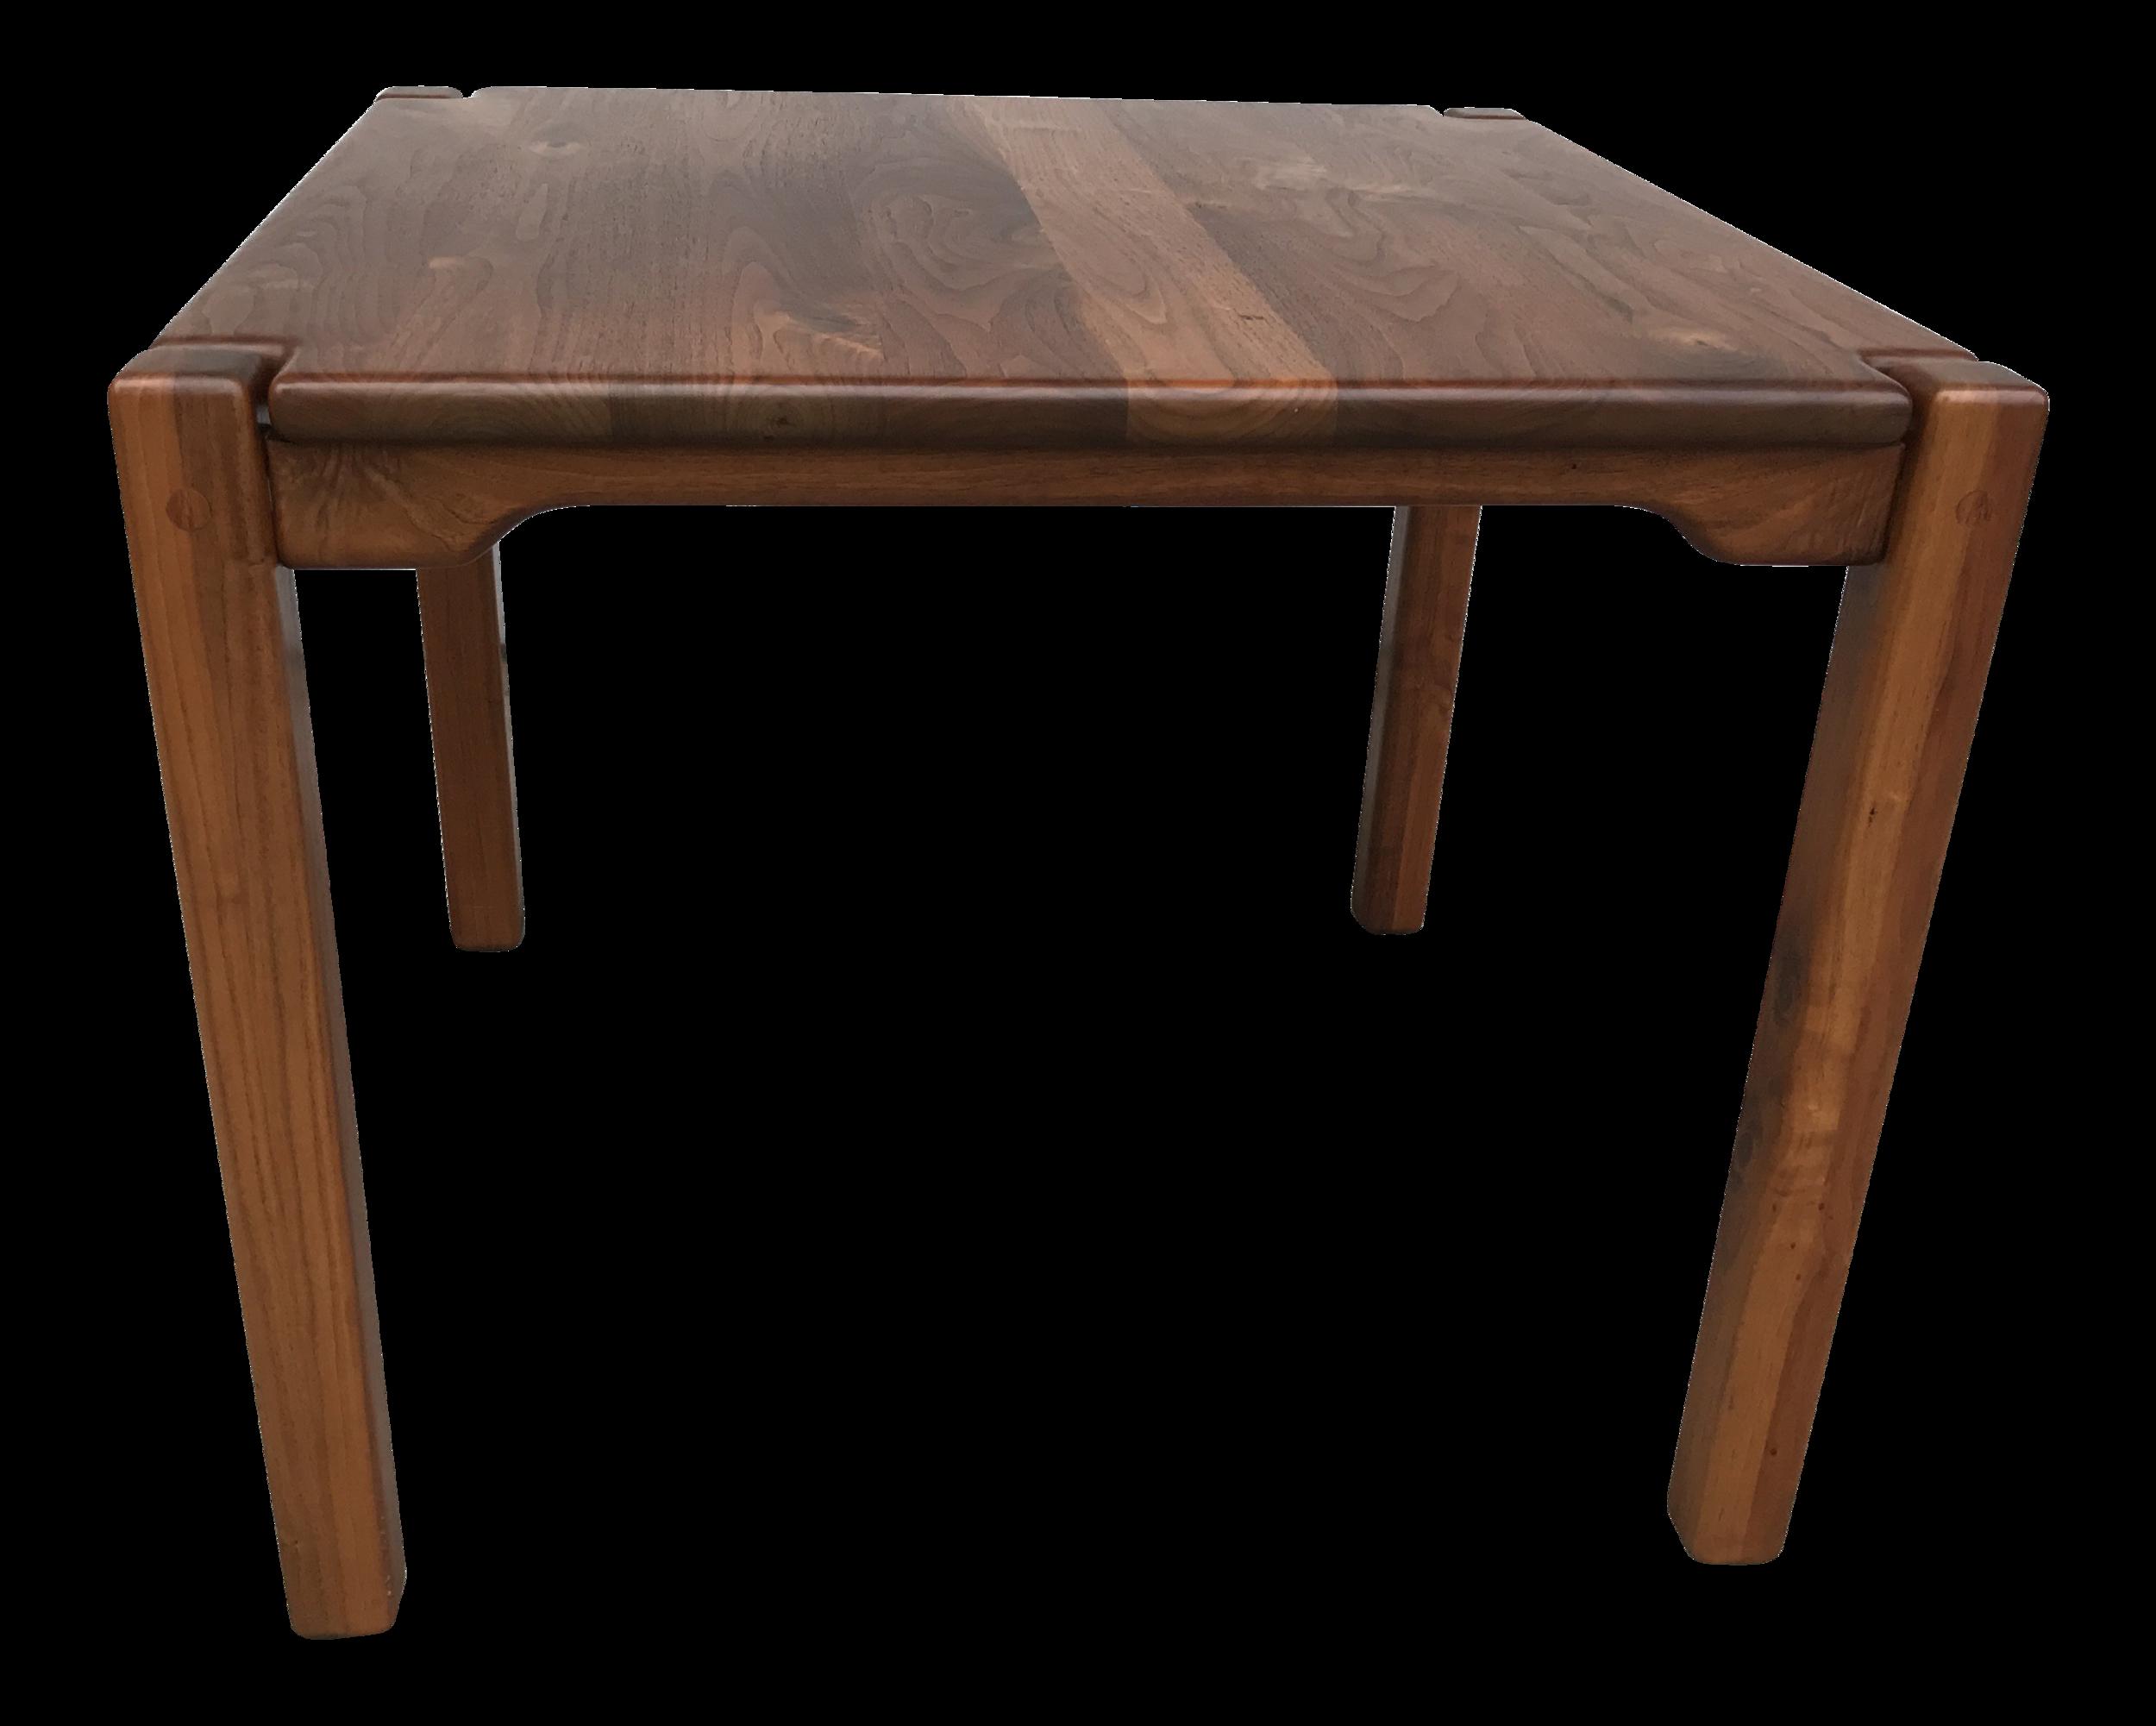 1980s-mid-century-modern-bruce-mcquilkin-koa-wood-dining-table-0776.png